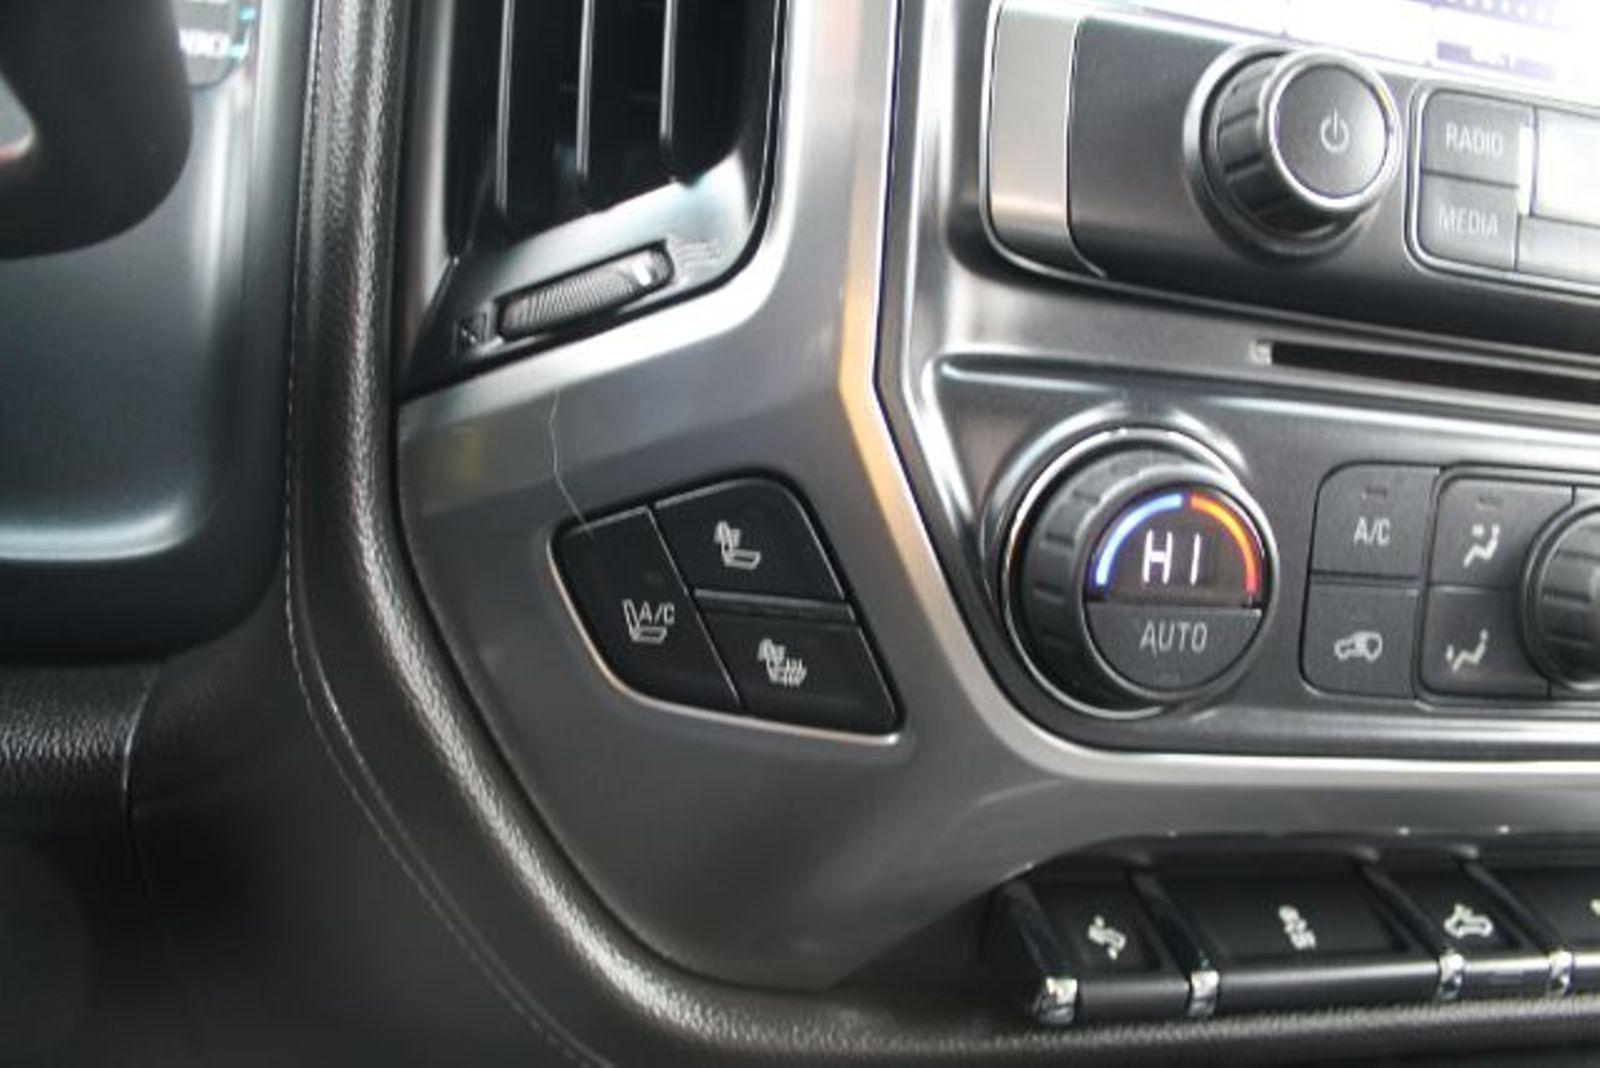 2015 Chevrolet Silverado 2500hd Ltz City Mt Bleskin Motor Company Chevy Radio Upgrade In Great Falls